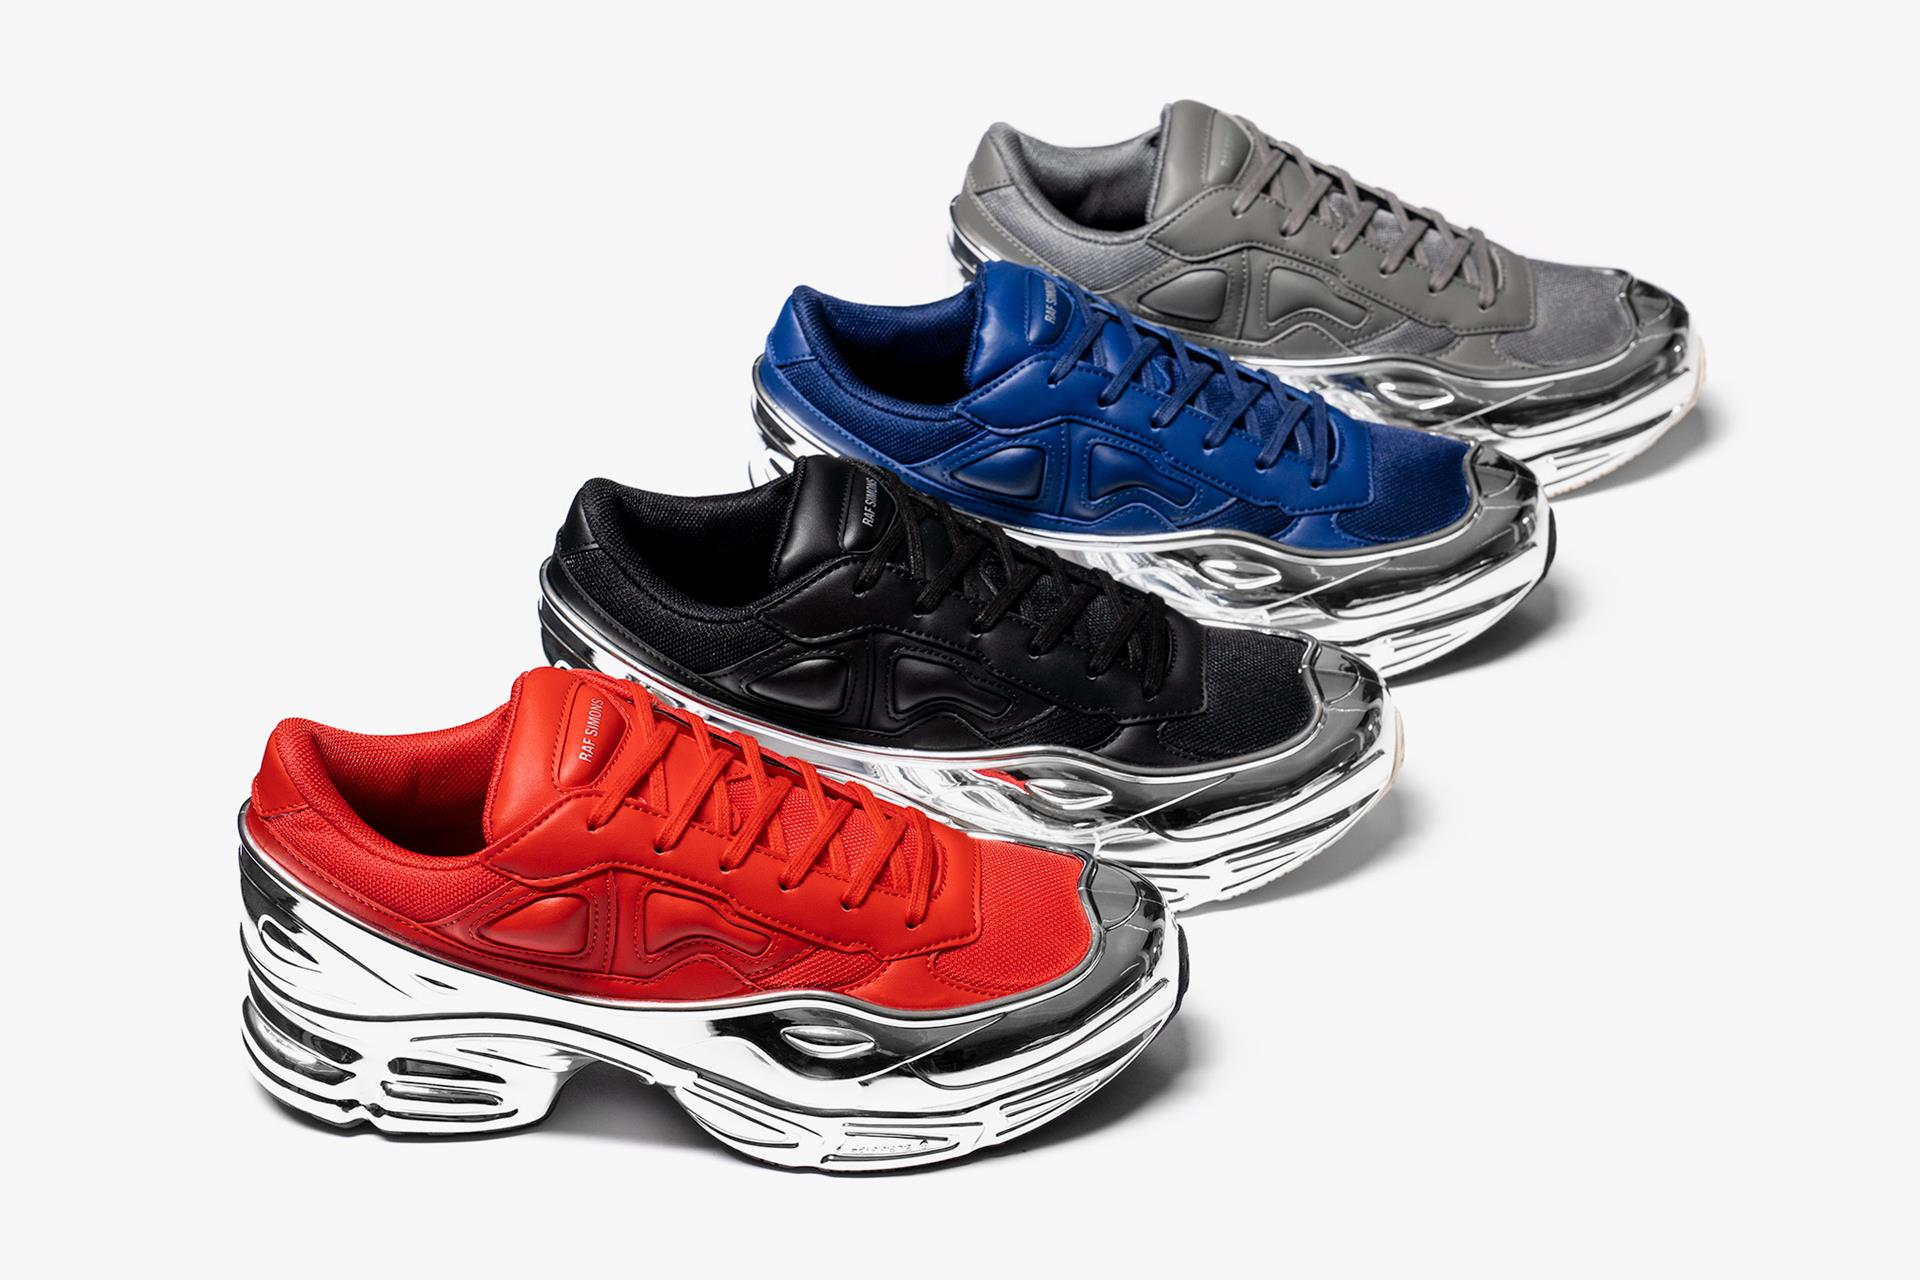 adidas x Raf Simons Ozweego Chrome Pack   Release Date: 05.23.19